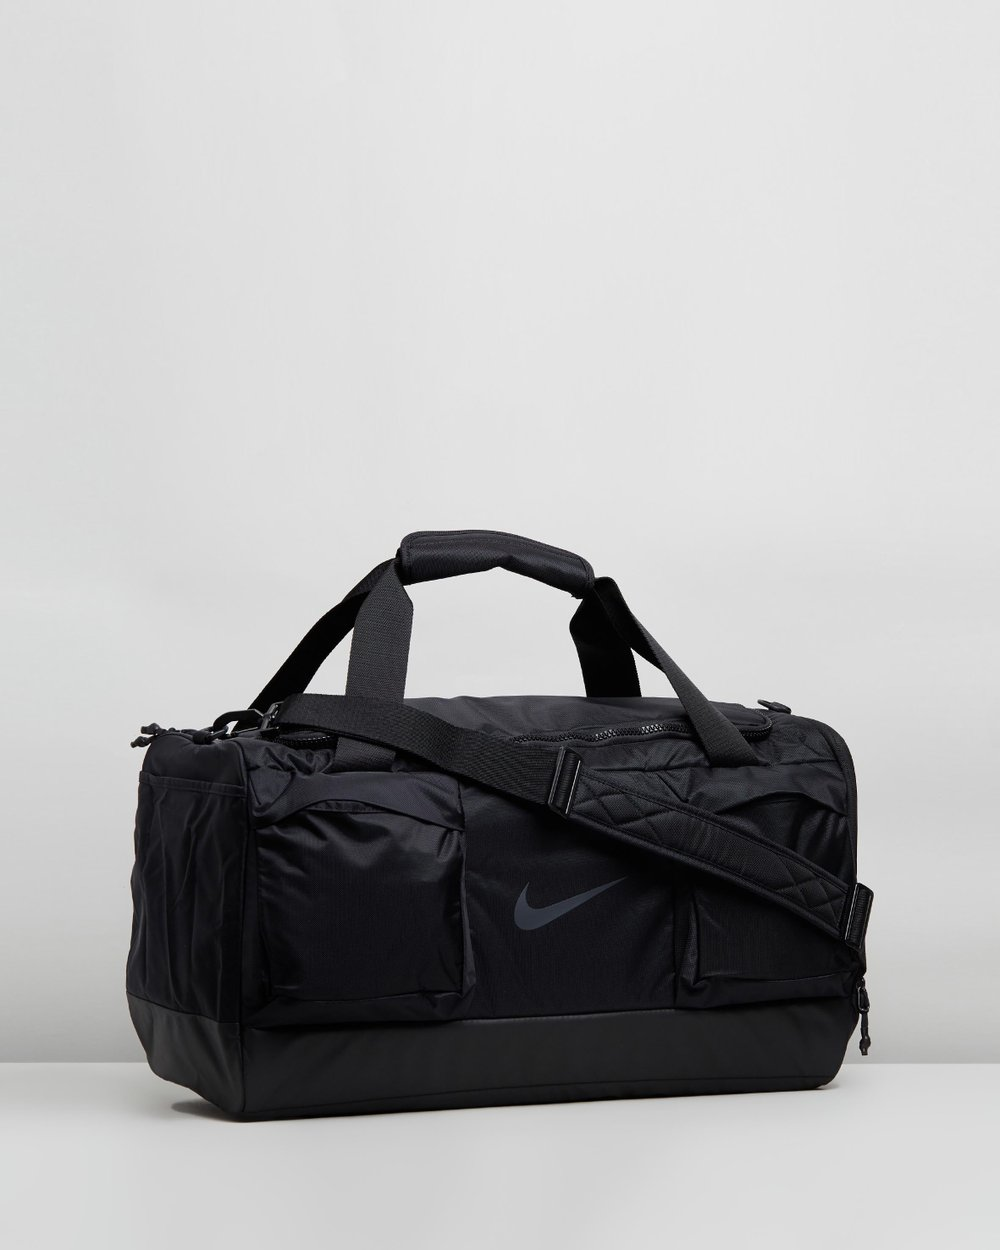 f8f58d823f0 Vapor Power Duffle Bag by Nike Online